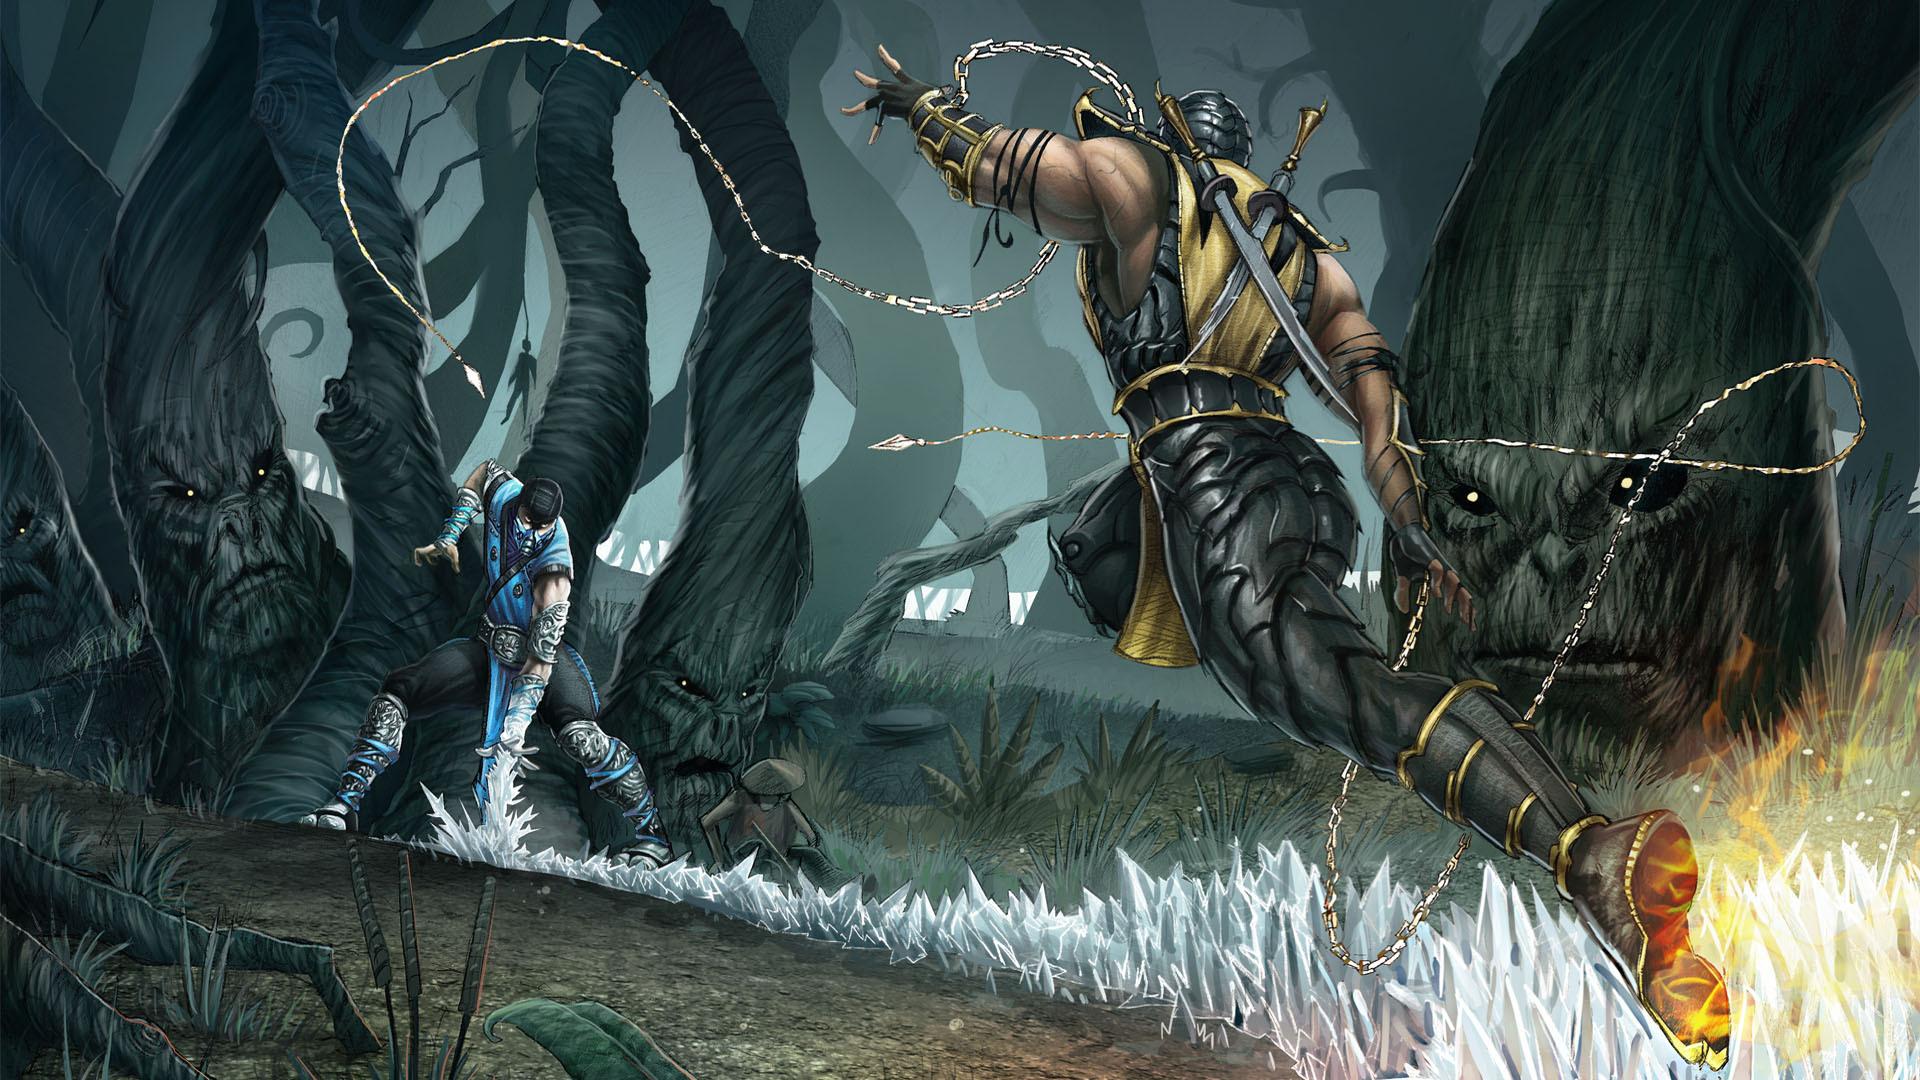 Mortal Kombat   Mortal Kombat Wallpaper 23289786 1920x1080